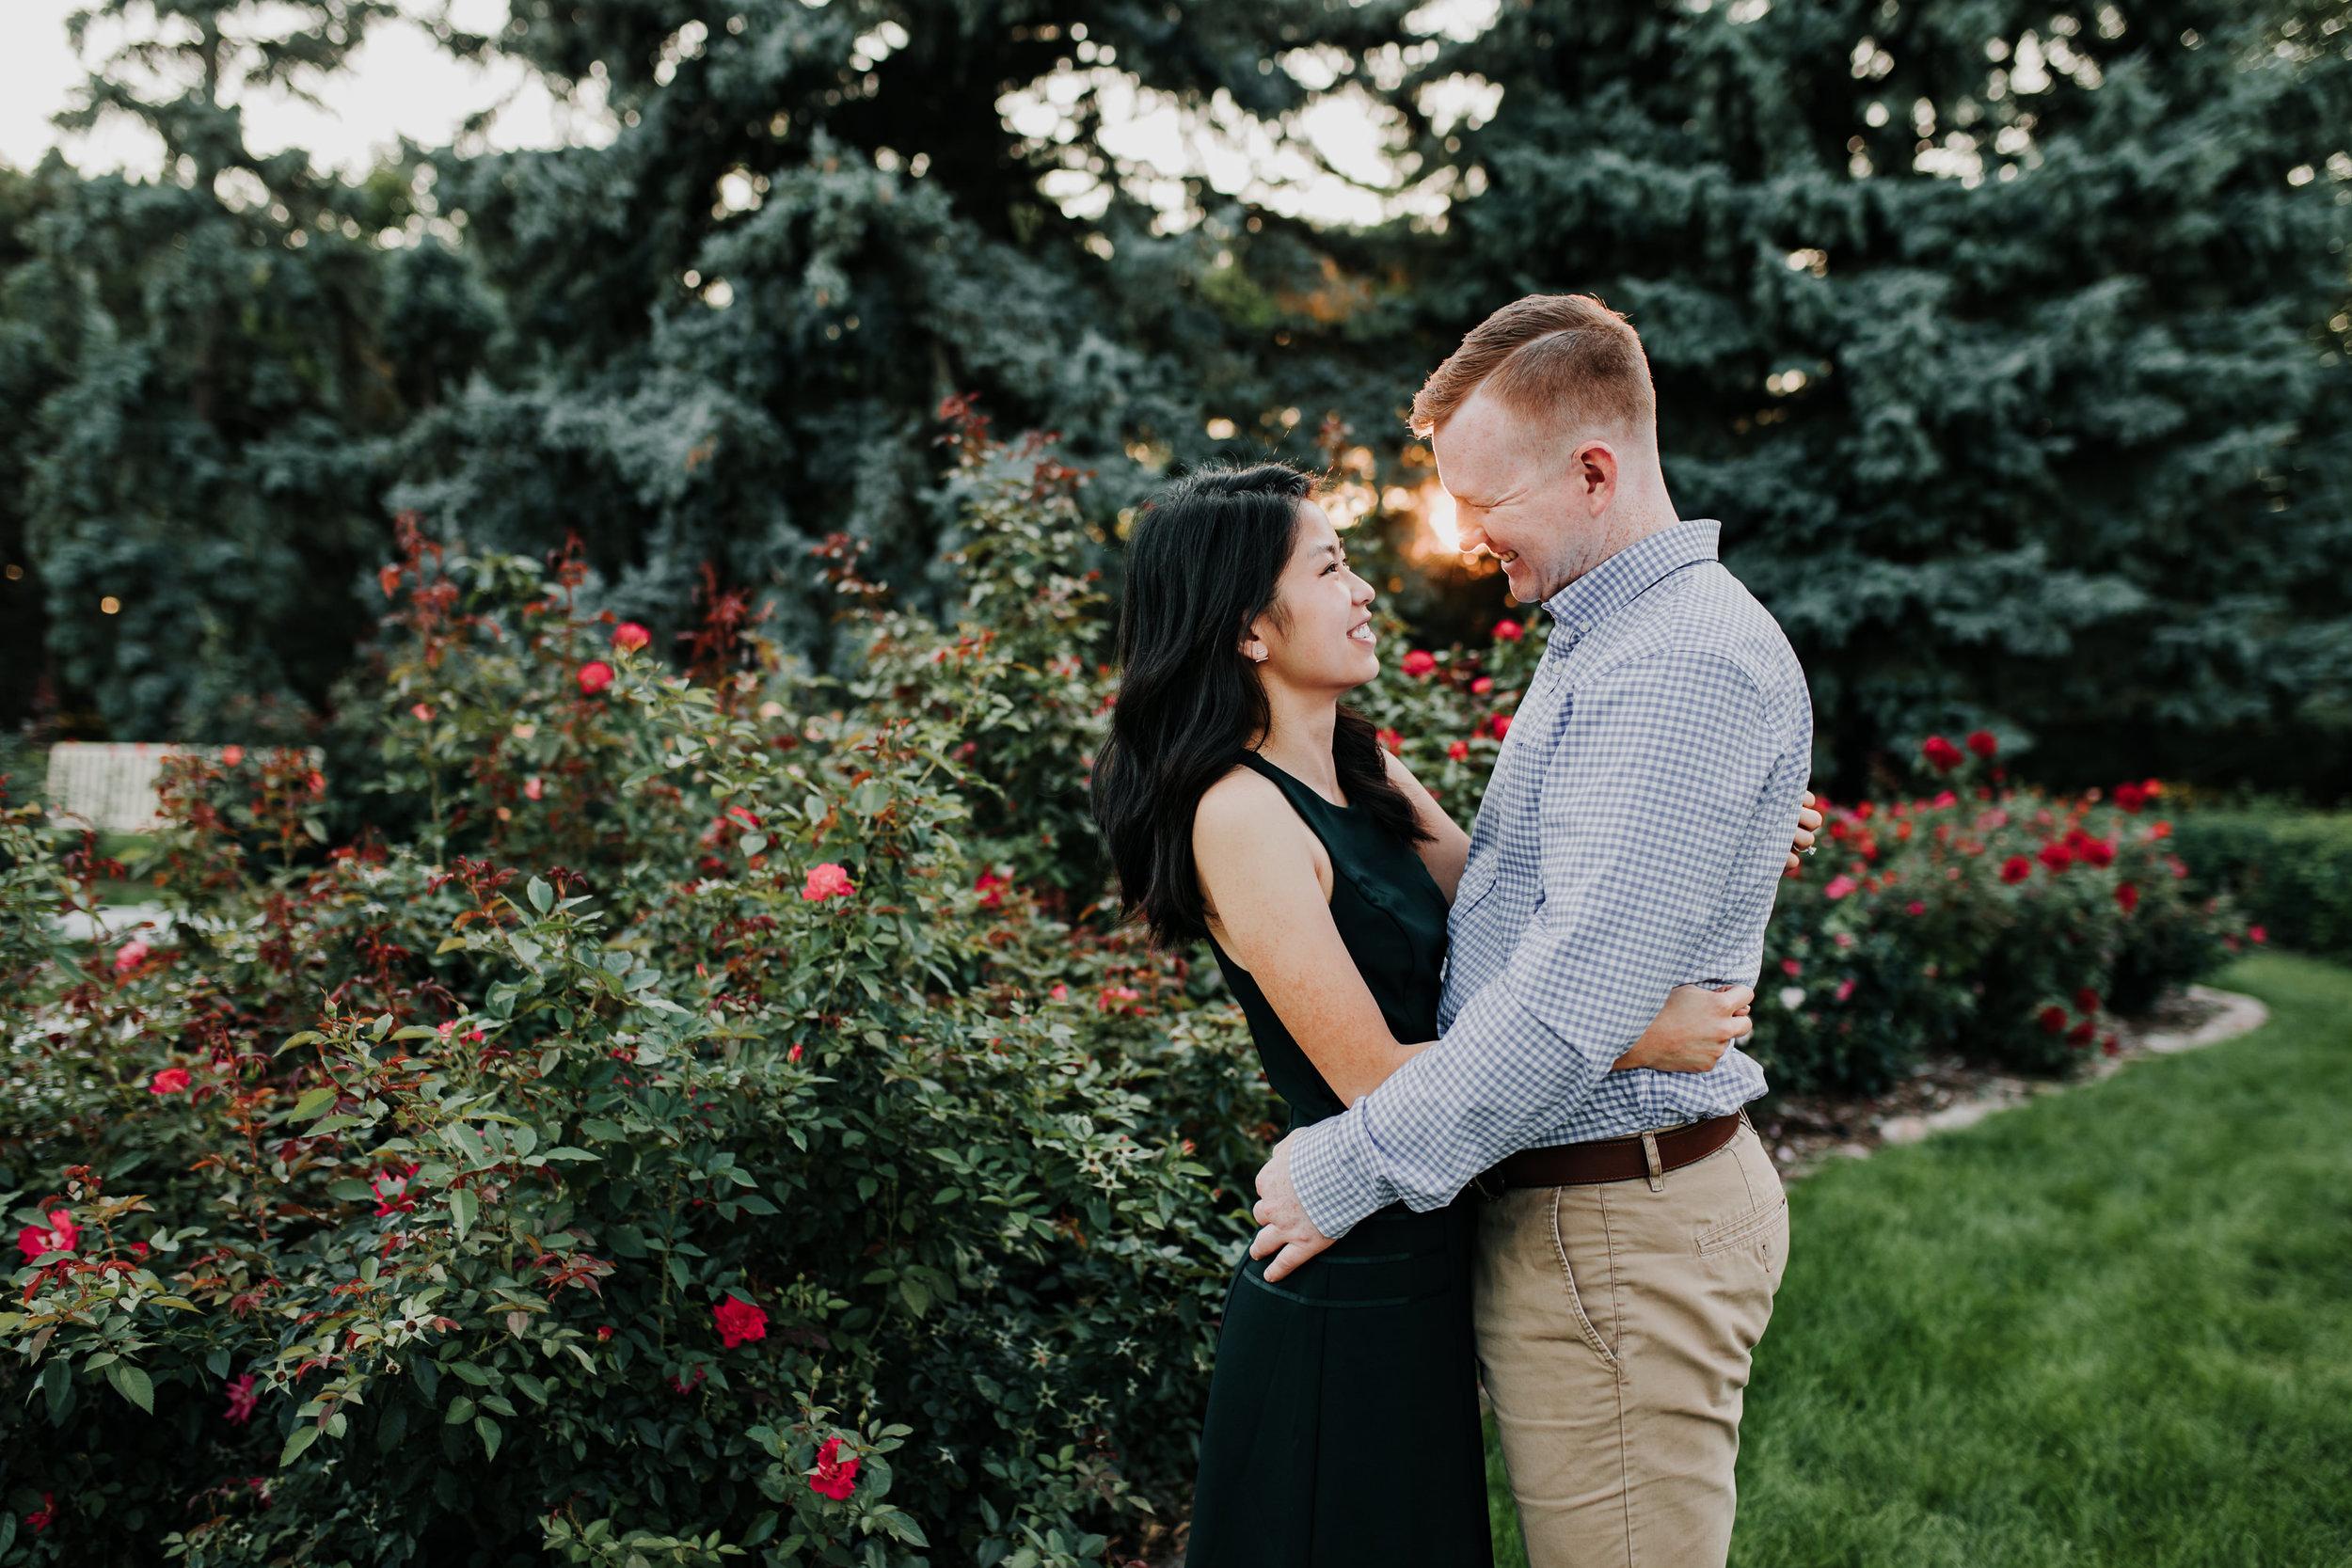 Catherin & Kyle - Married - Nathaniel Jensen Photography - Omaha Nebraska Wedding Photograper - Memorial Park - Joslyn Castle Engagement Session-56.jpg